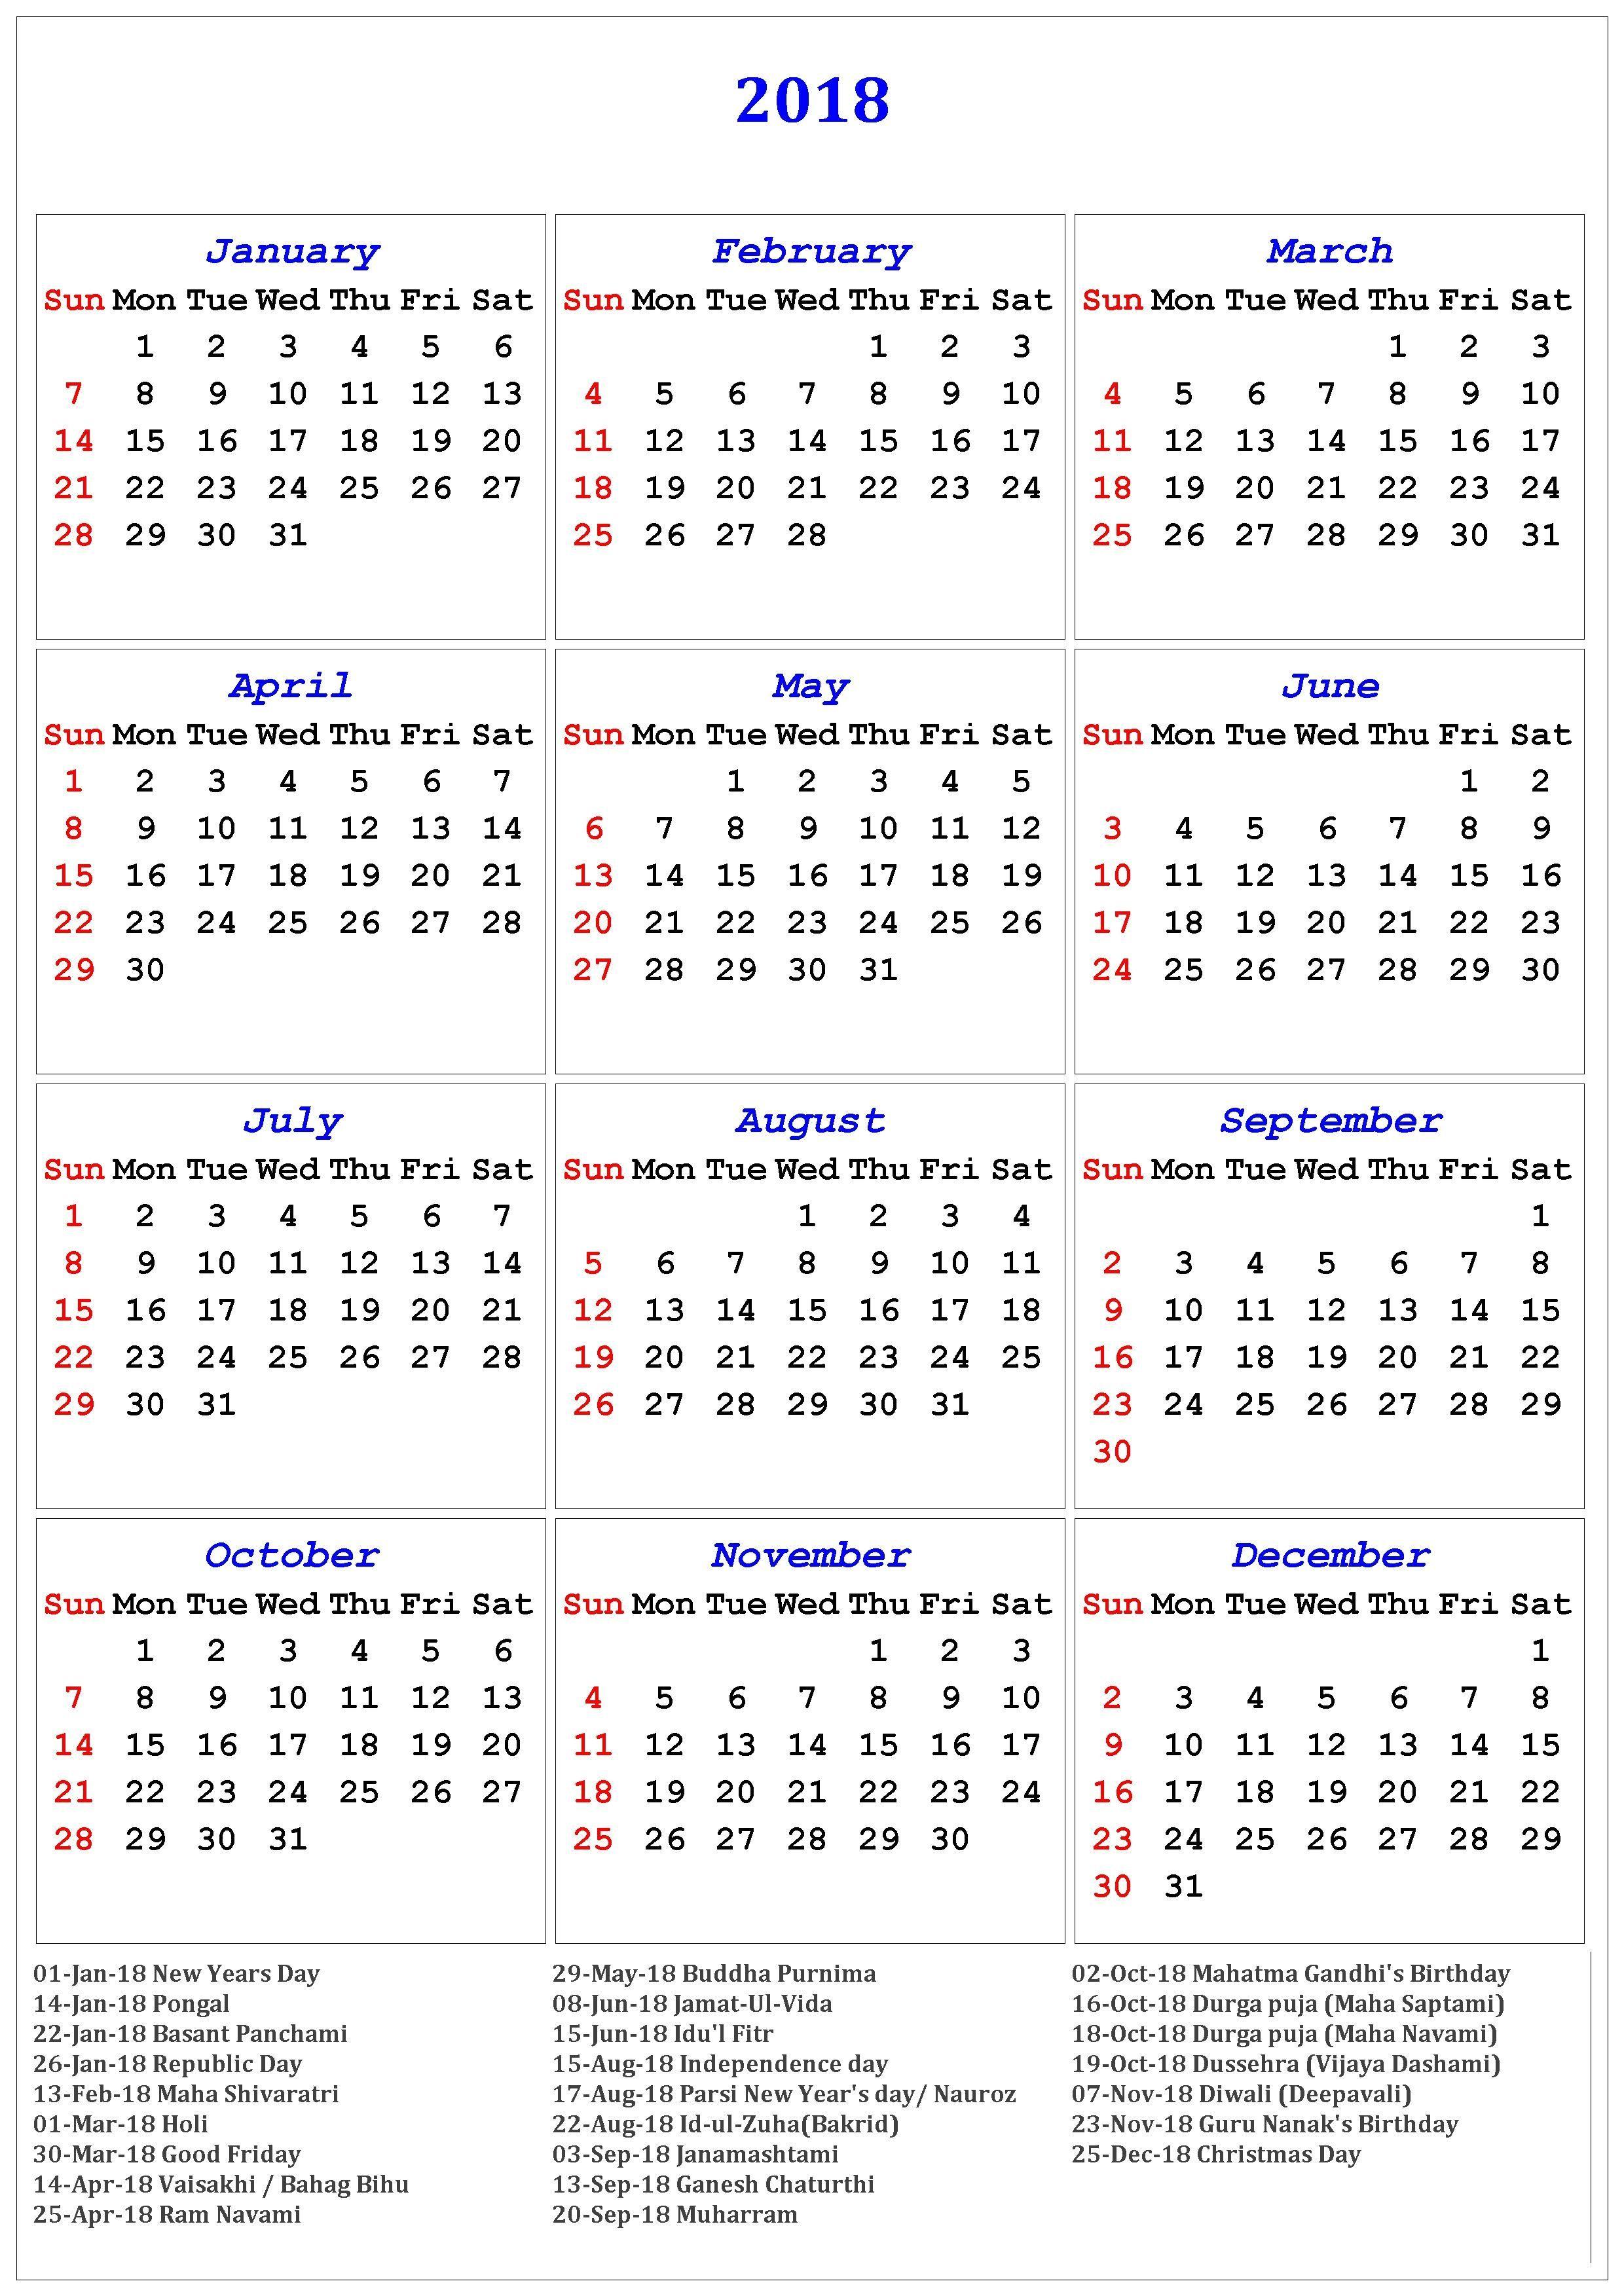 2020 Holiday Calendar List 2018 Calendar Of Holidays | November Calendar | November calendar